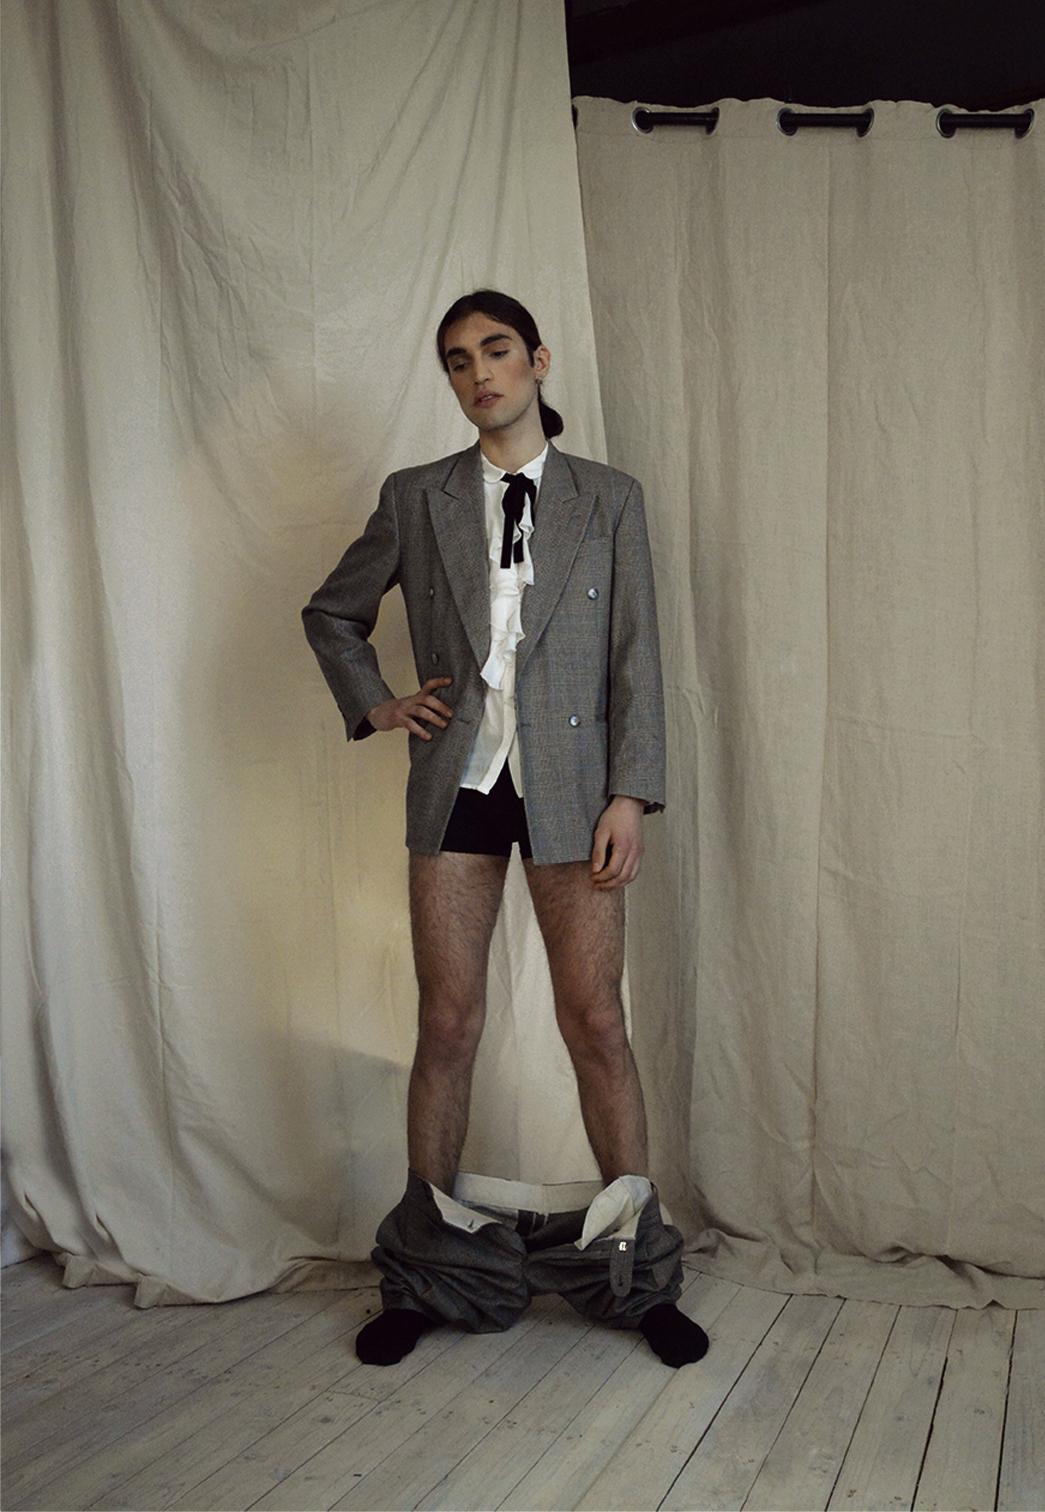 Thirty time Bernard  Published On 01 Fabruary 2016   Photographer  Annabelle Foucher  MUAH  Marie Ferté  Model  Eric Sakai